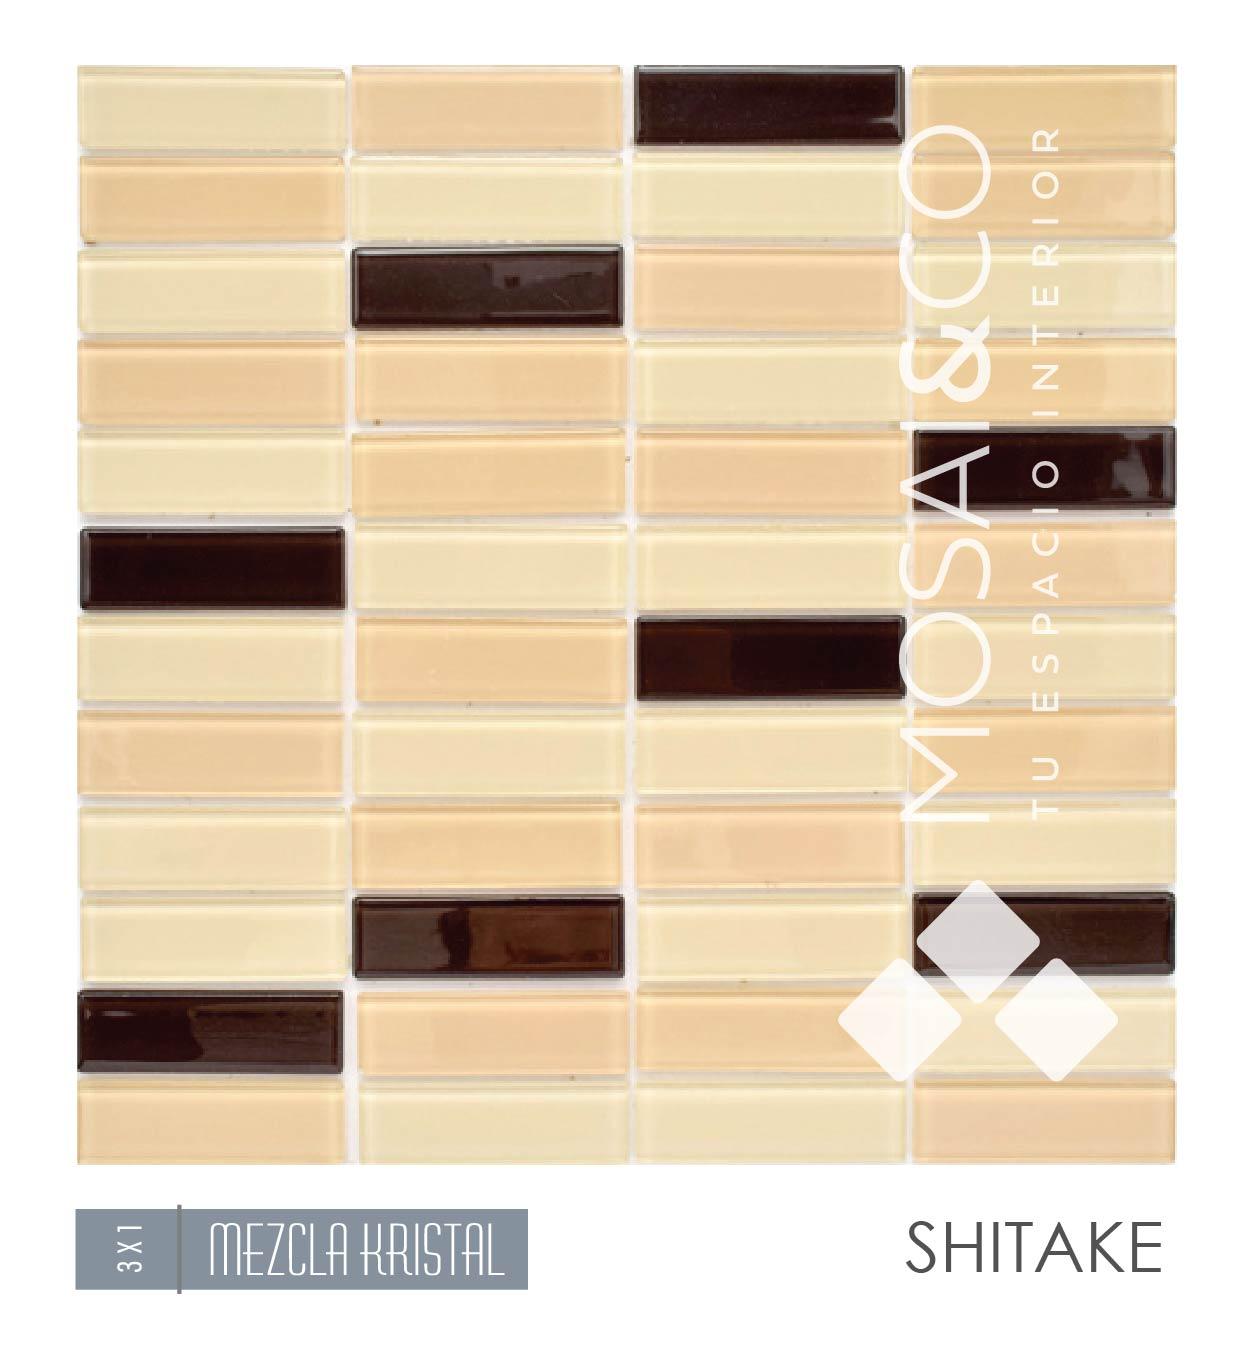 mosaico-linea-mezcla-kristal-mosaiandco-3X1-shitake